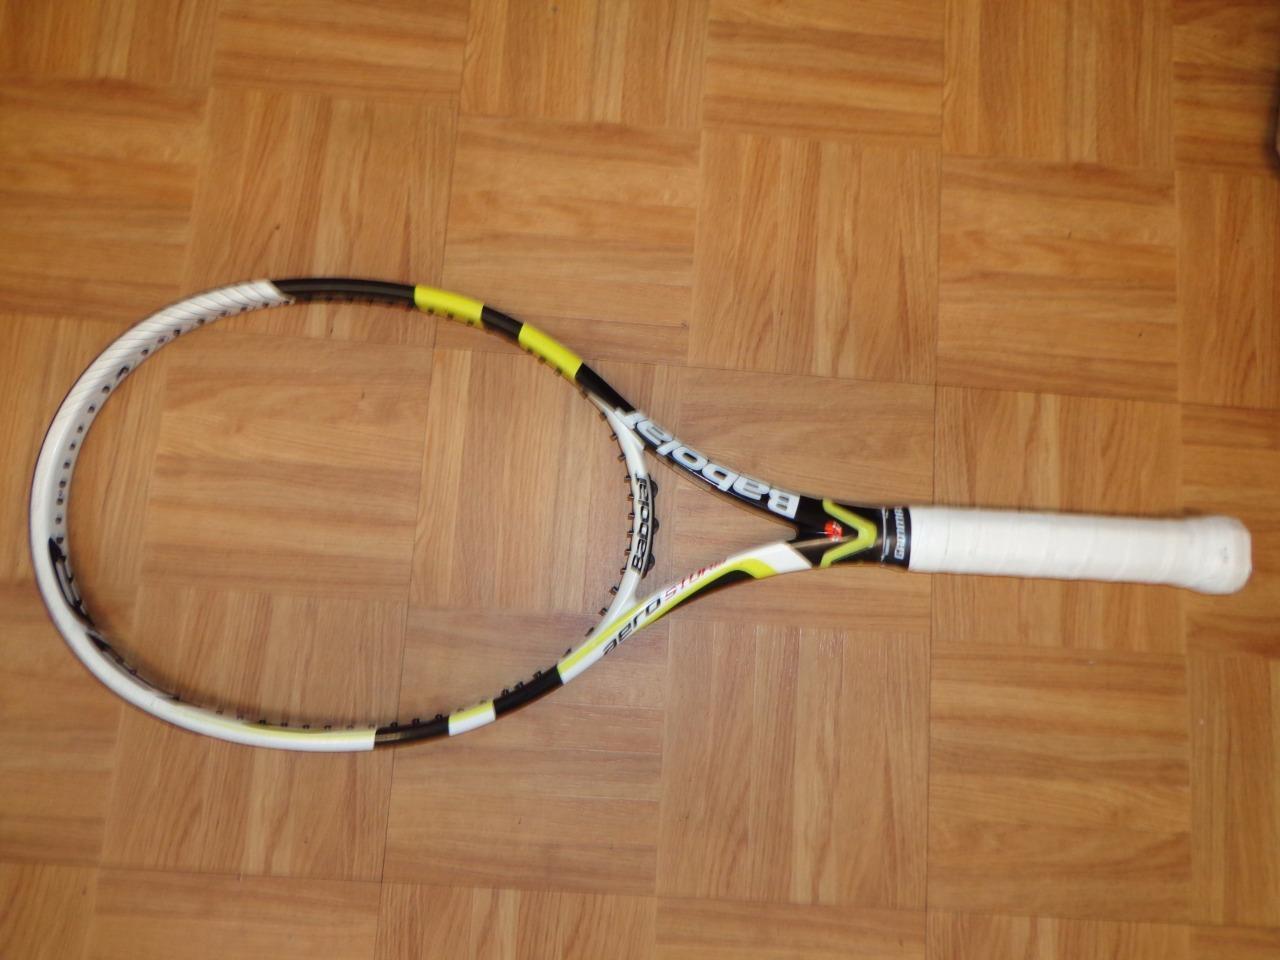 Babolat Aero Storm GT 98 Head 4 3 8 Grip 10.6 oz (environ 300.50 g) Raquette de Tennis